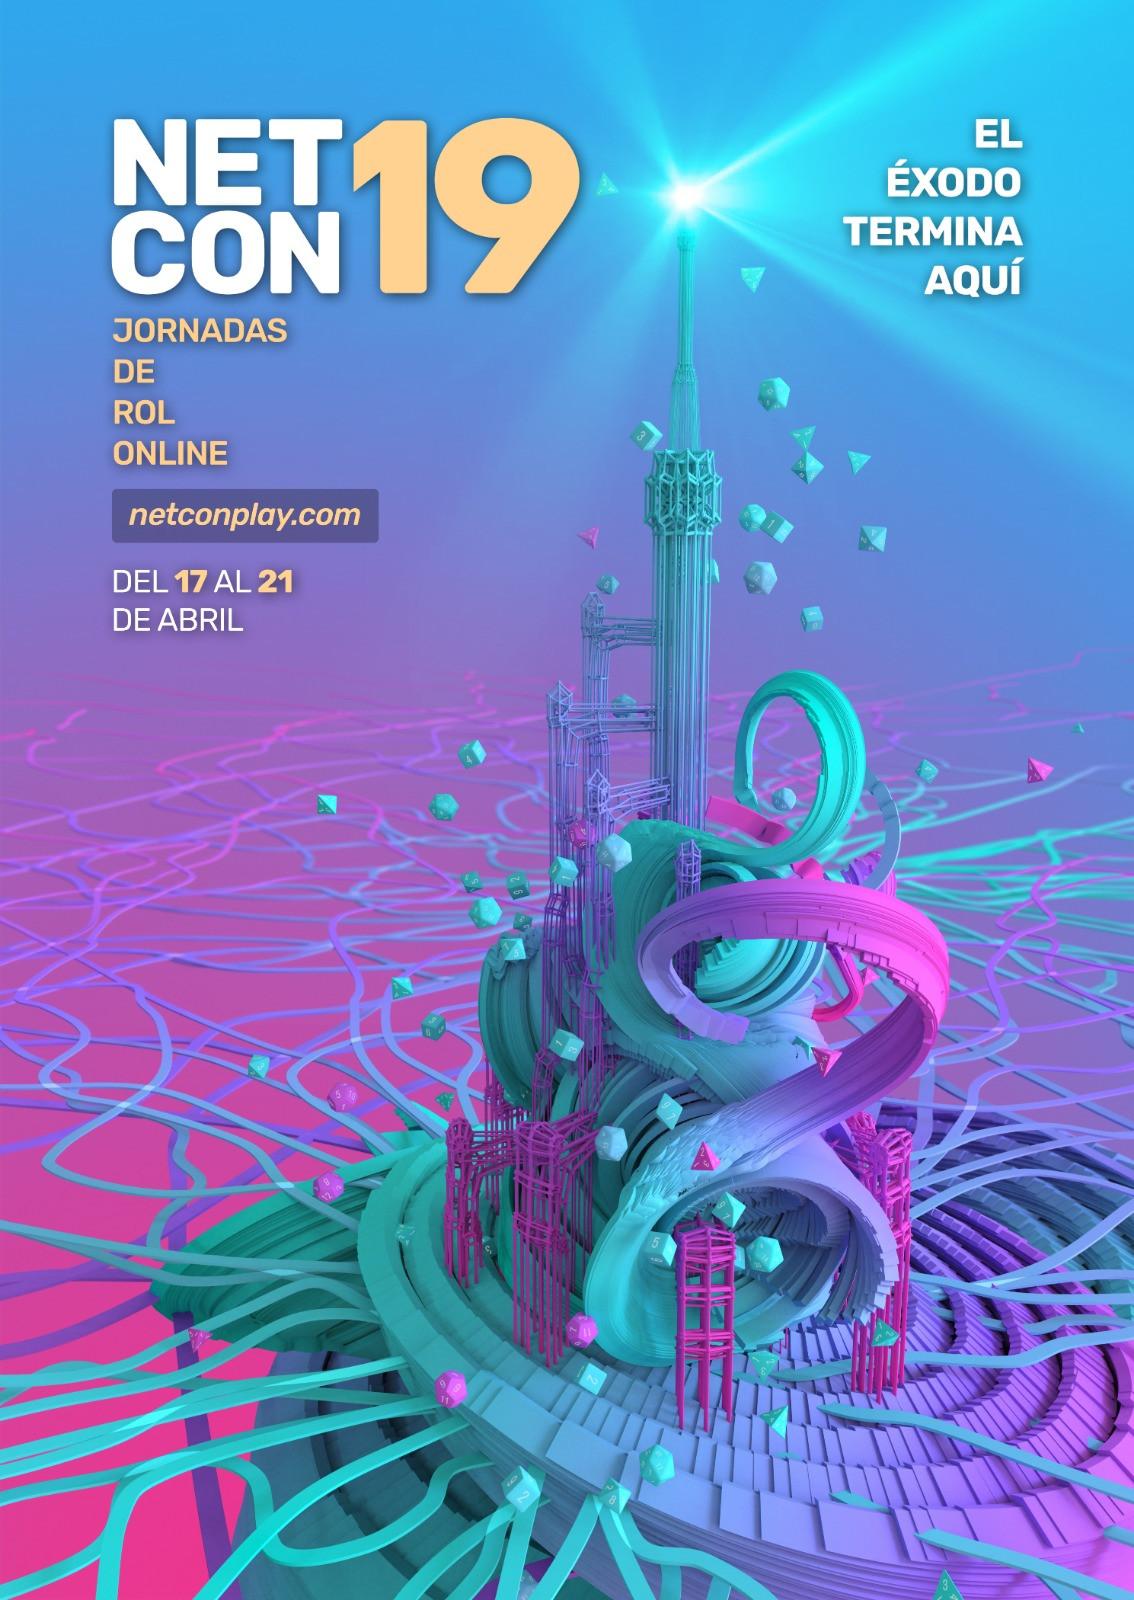 NetCon 19 - Jornadas de Rol Online